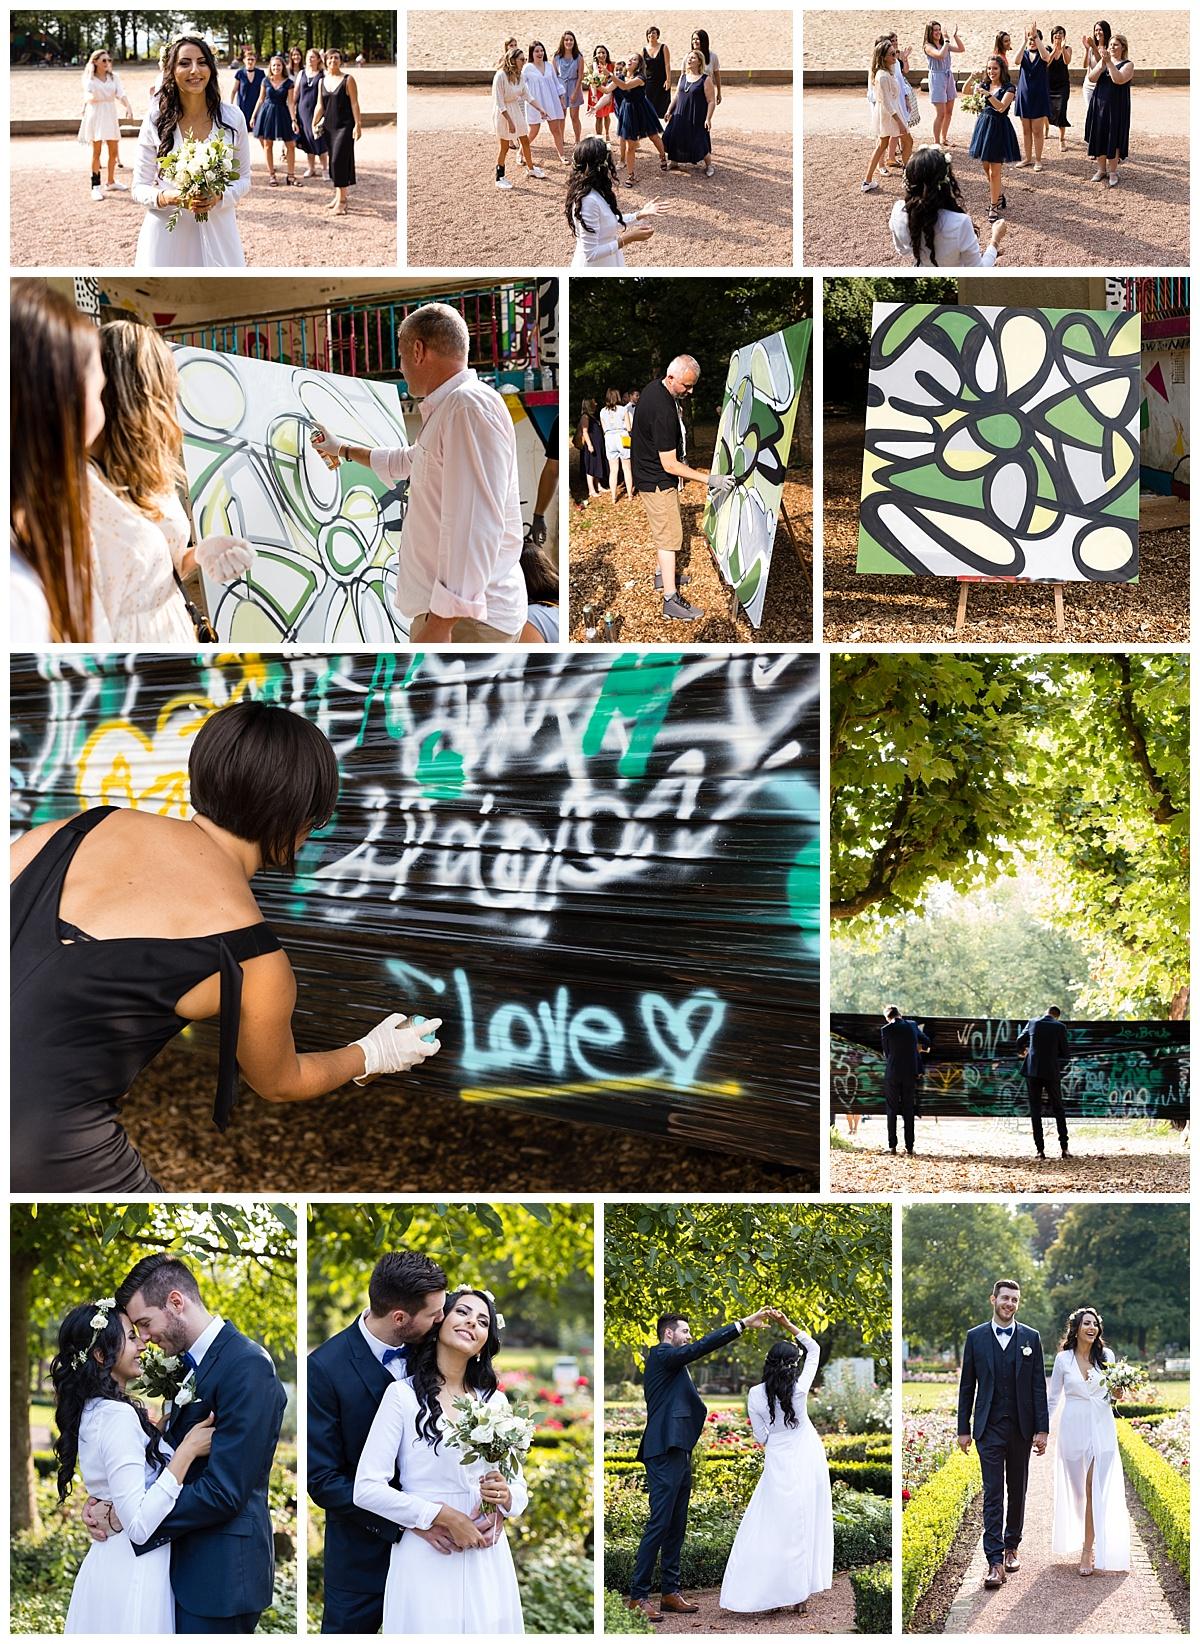 Atelier mariage street art